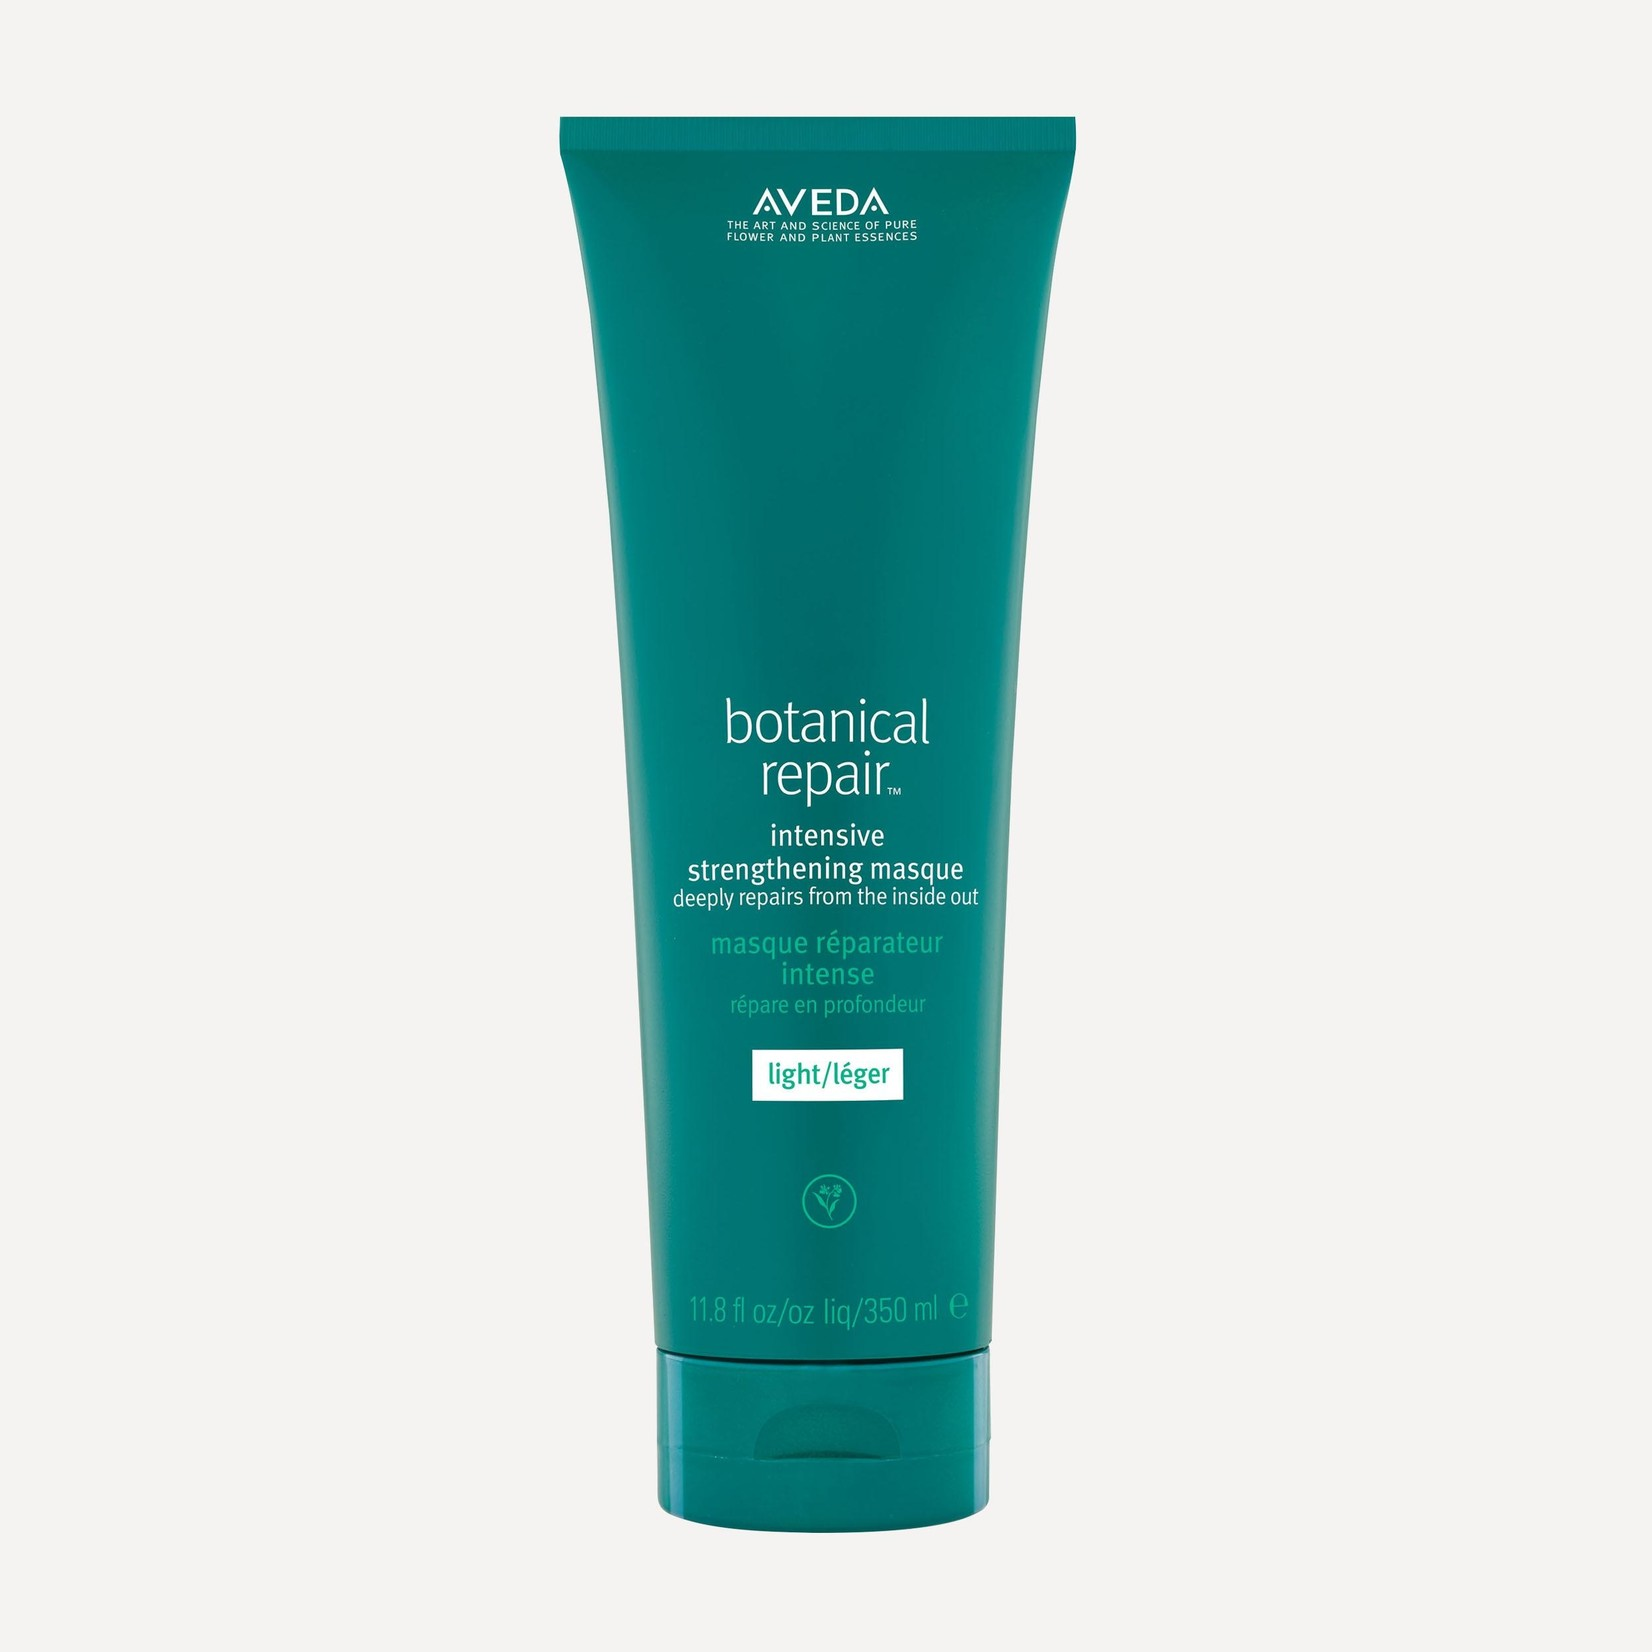 AVEDA Botanical Repair™ Intensive Masque: Light